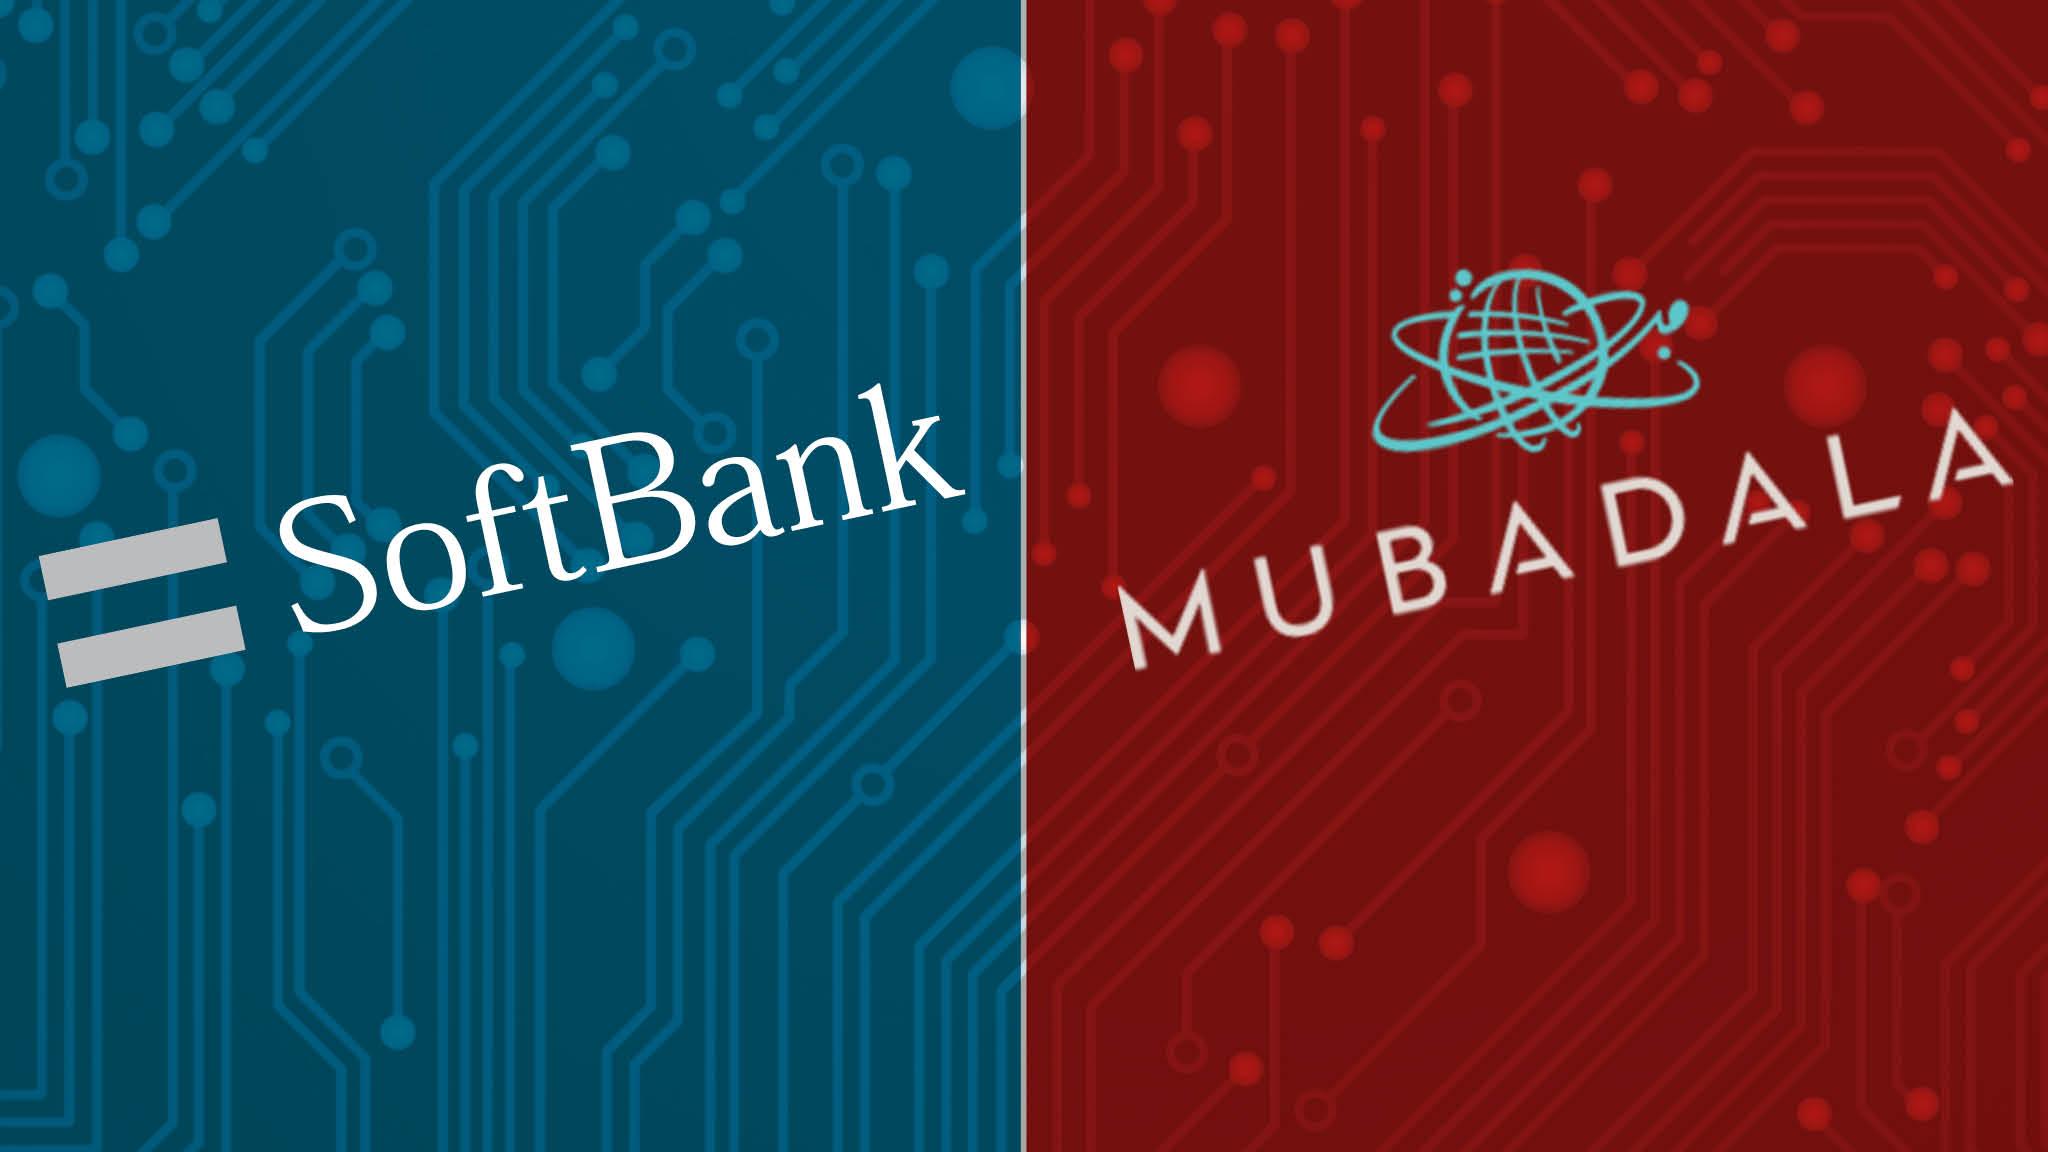 Softbank Backs Mubadalas New 400m European Tech Fund